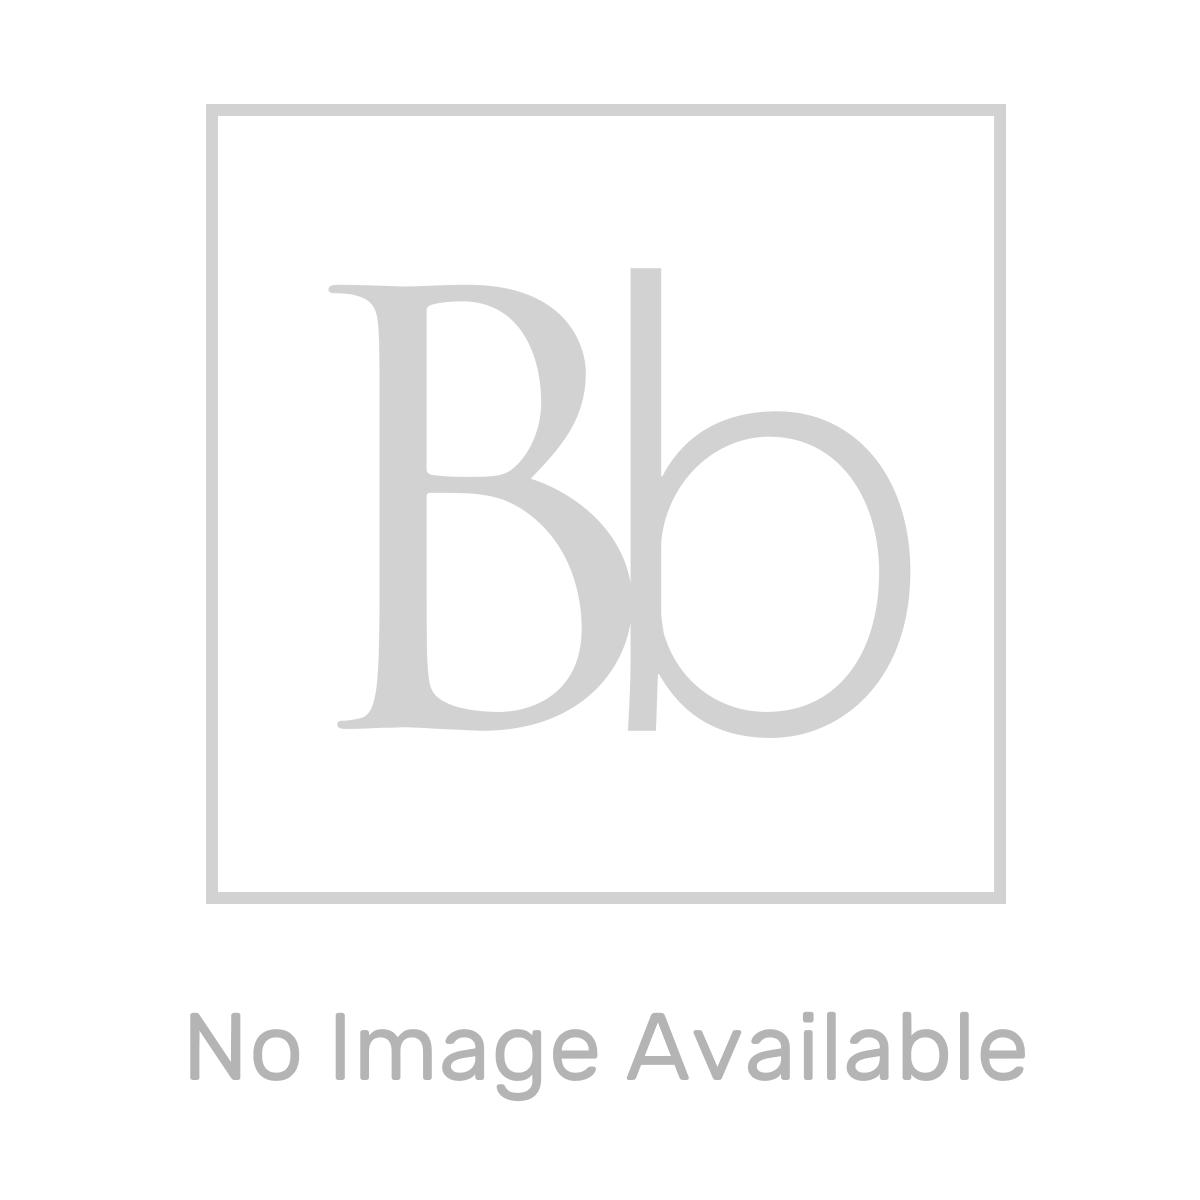 BTL Perla Marble Wall Hung 2-Drawer Vanity Unit with Basin 600mm